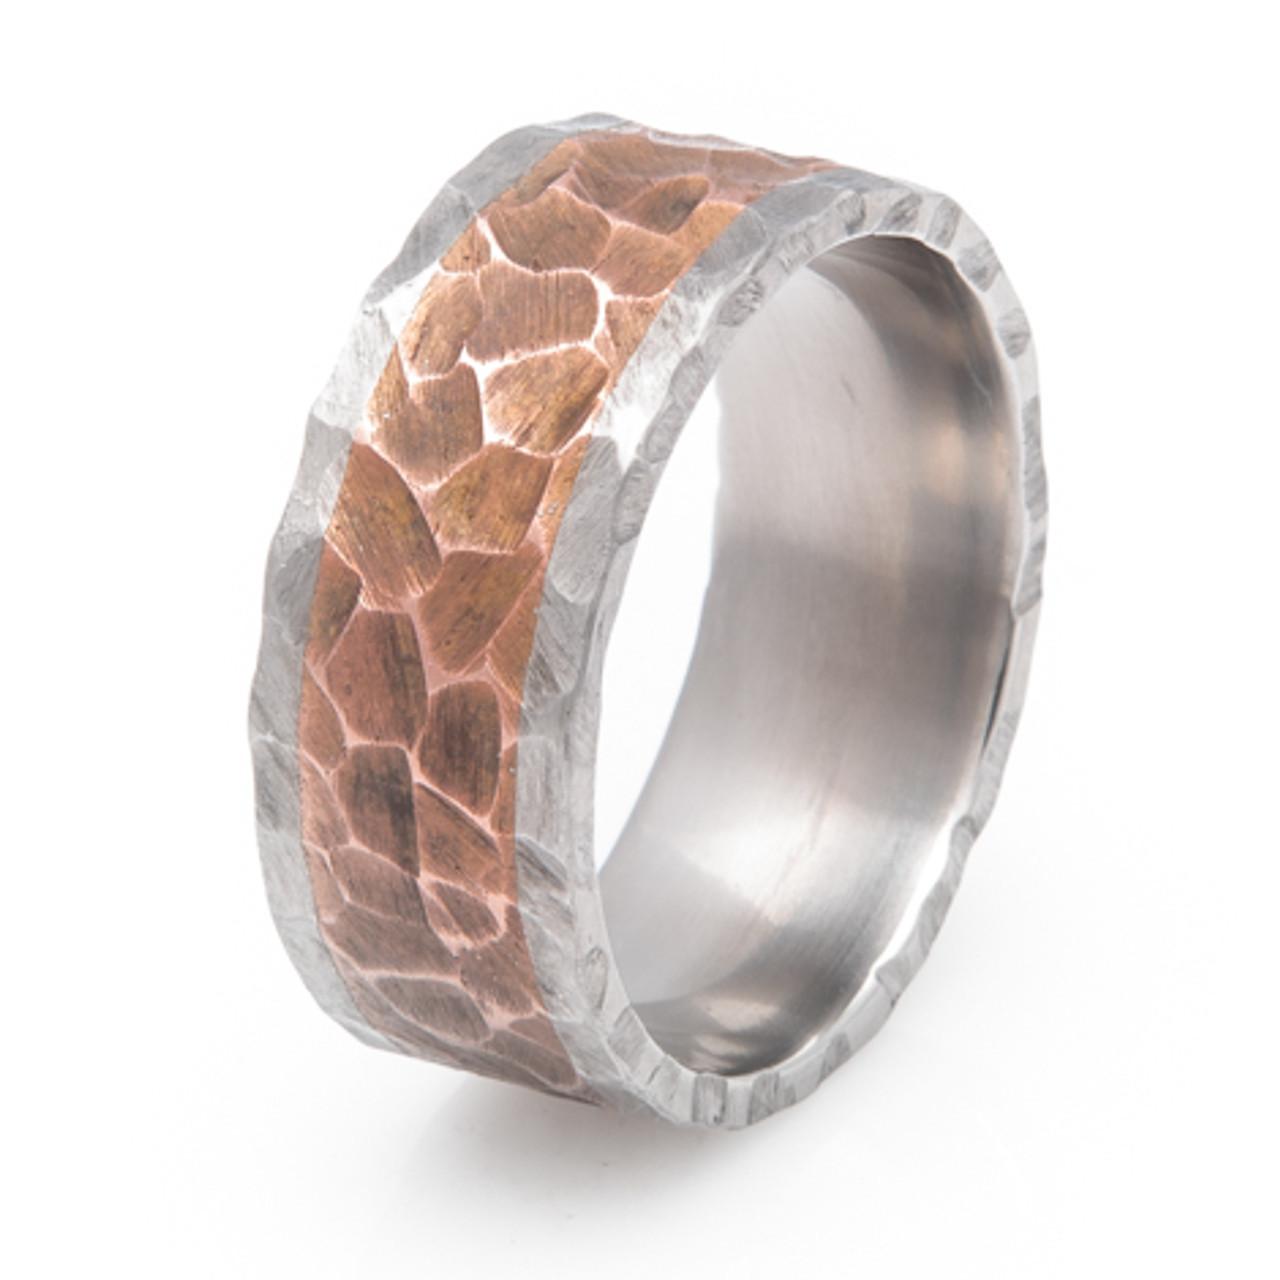 e538b04046313 Men's Titanium and Copper Inlay Rock Finish Ring